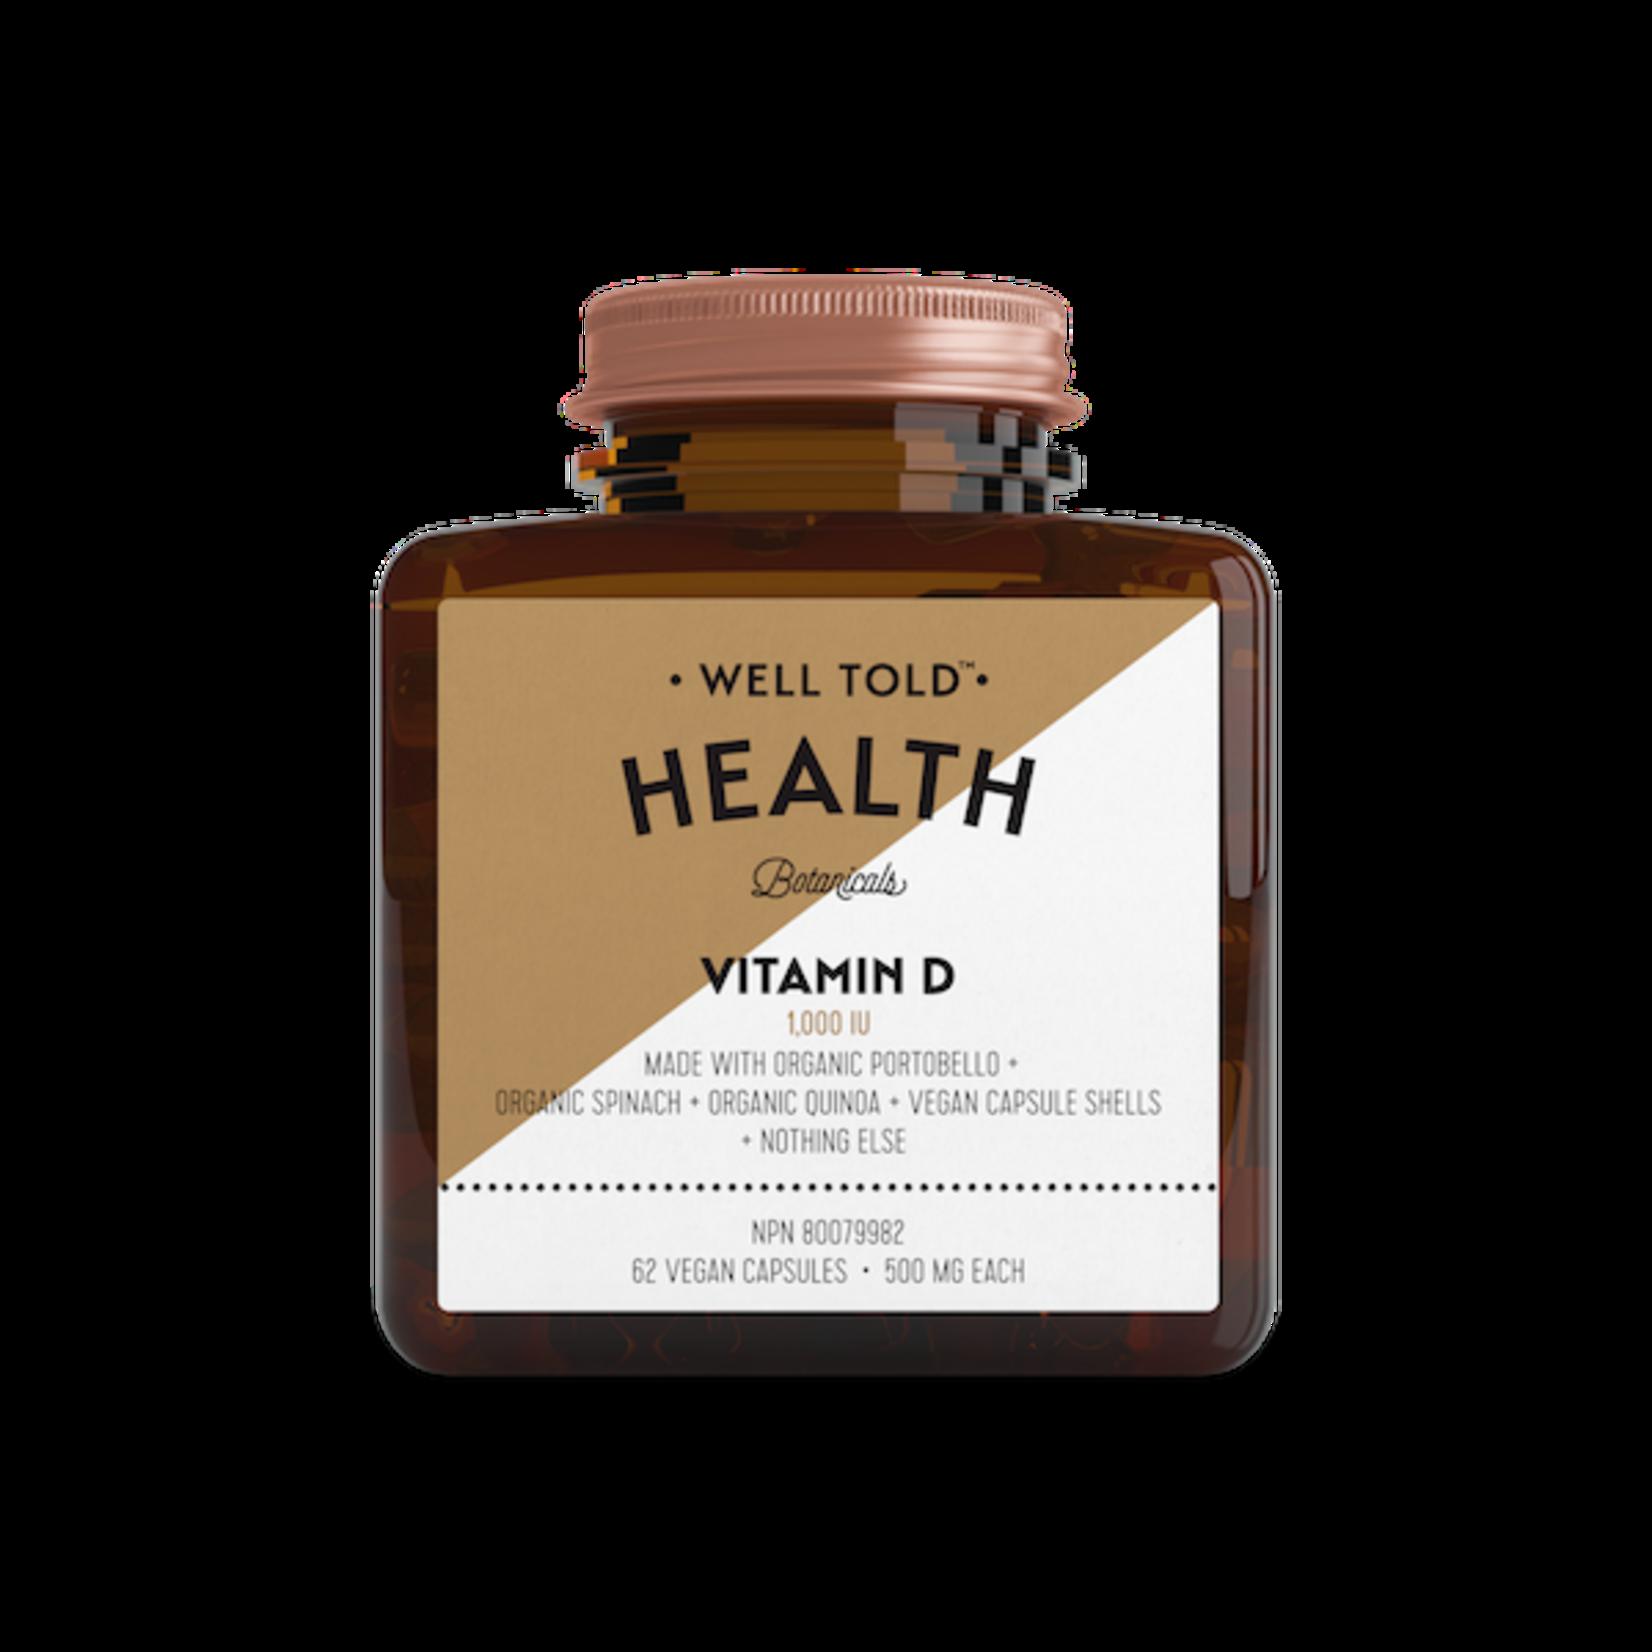 WELL TOLD HEALTH BOTANICALS Vitamin D